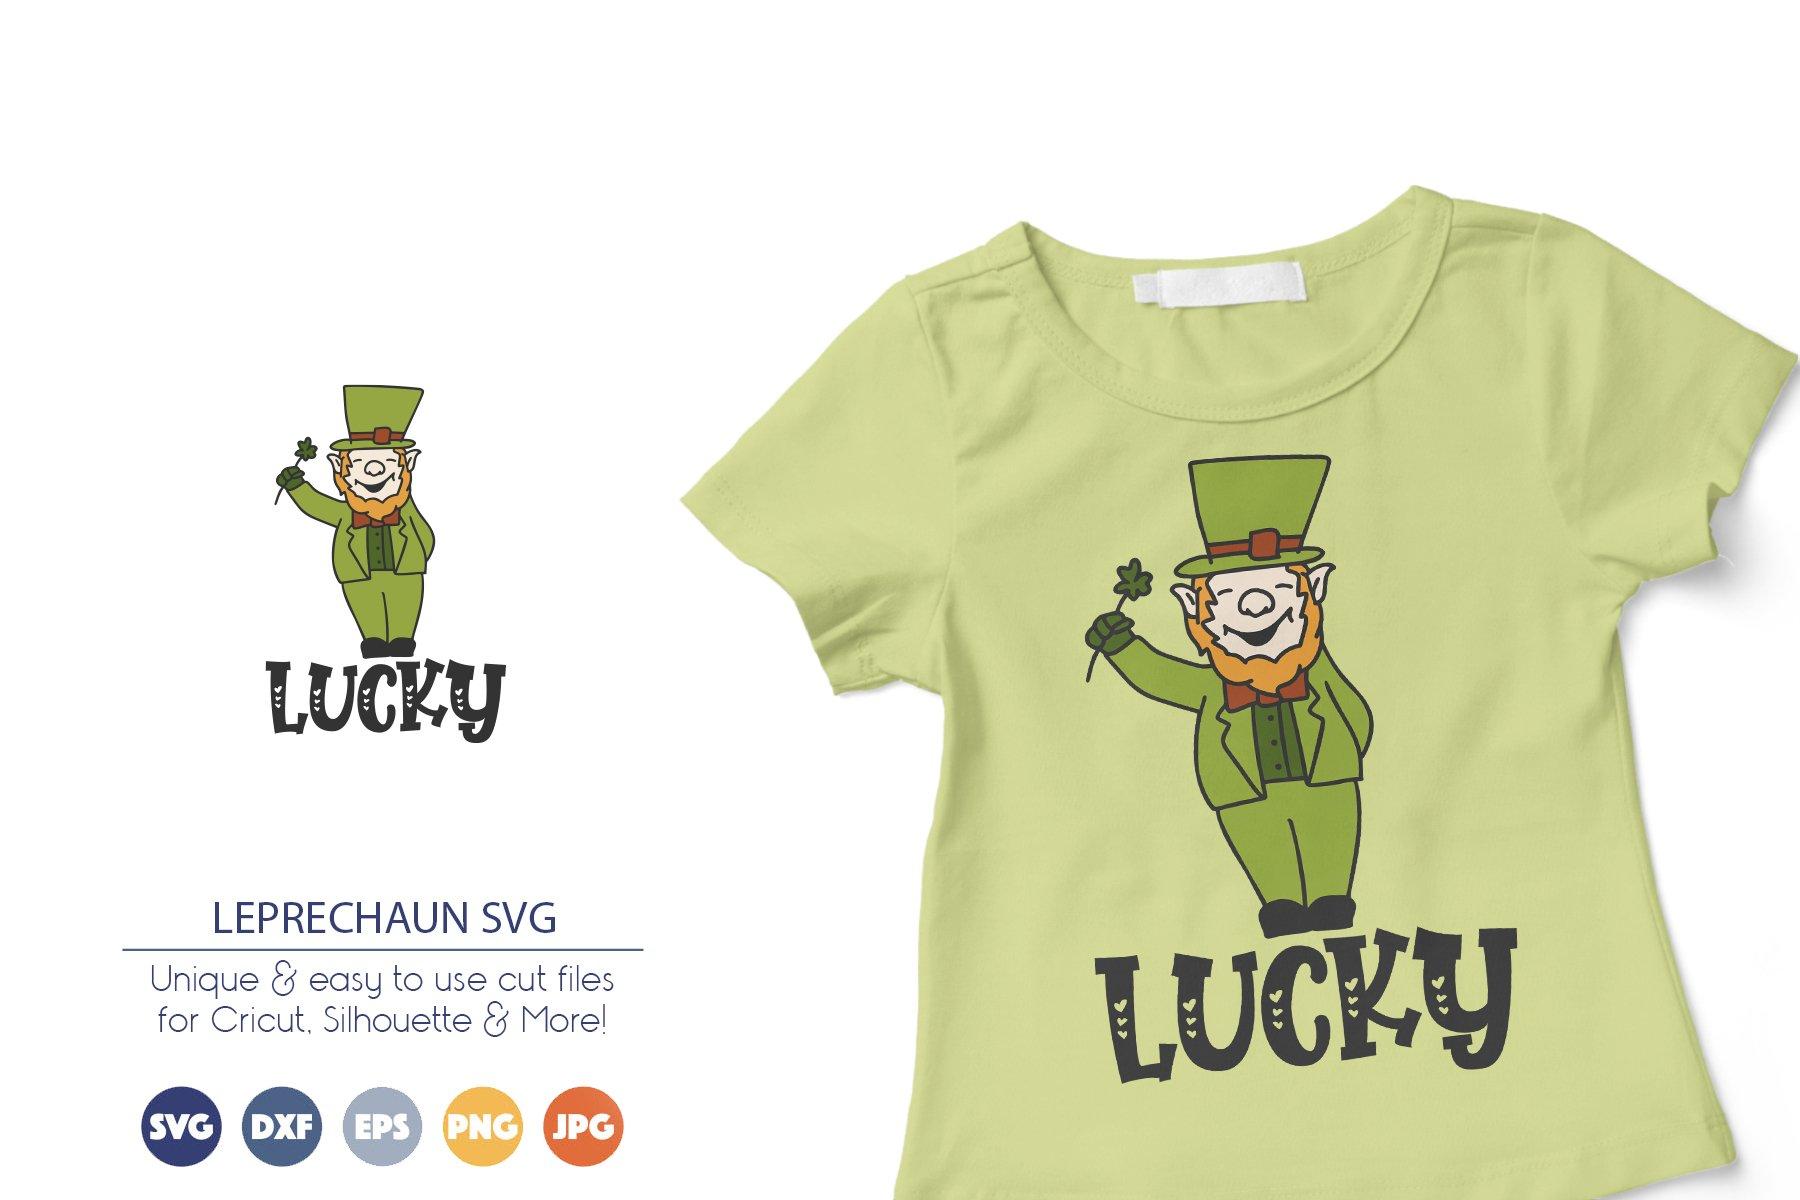 Leprechaun SVG | Lucky Irish SVG example image 1